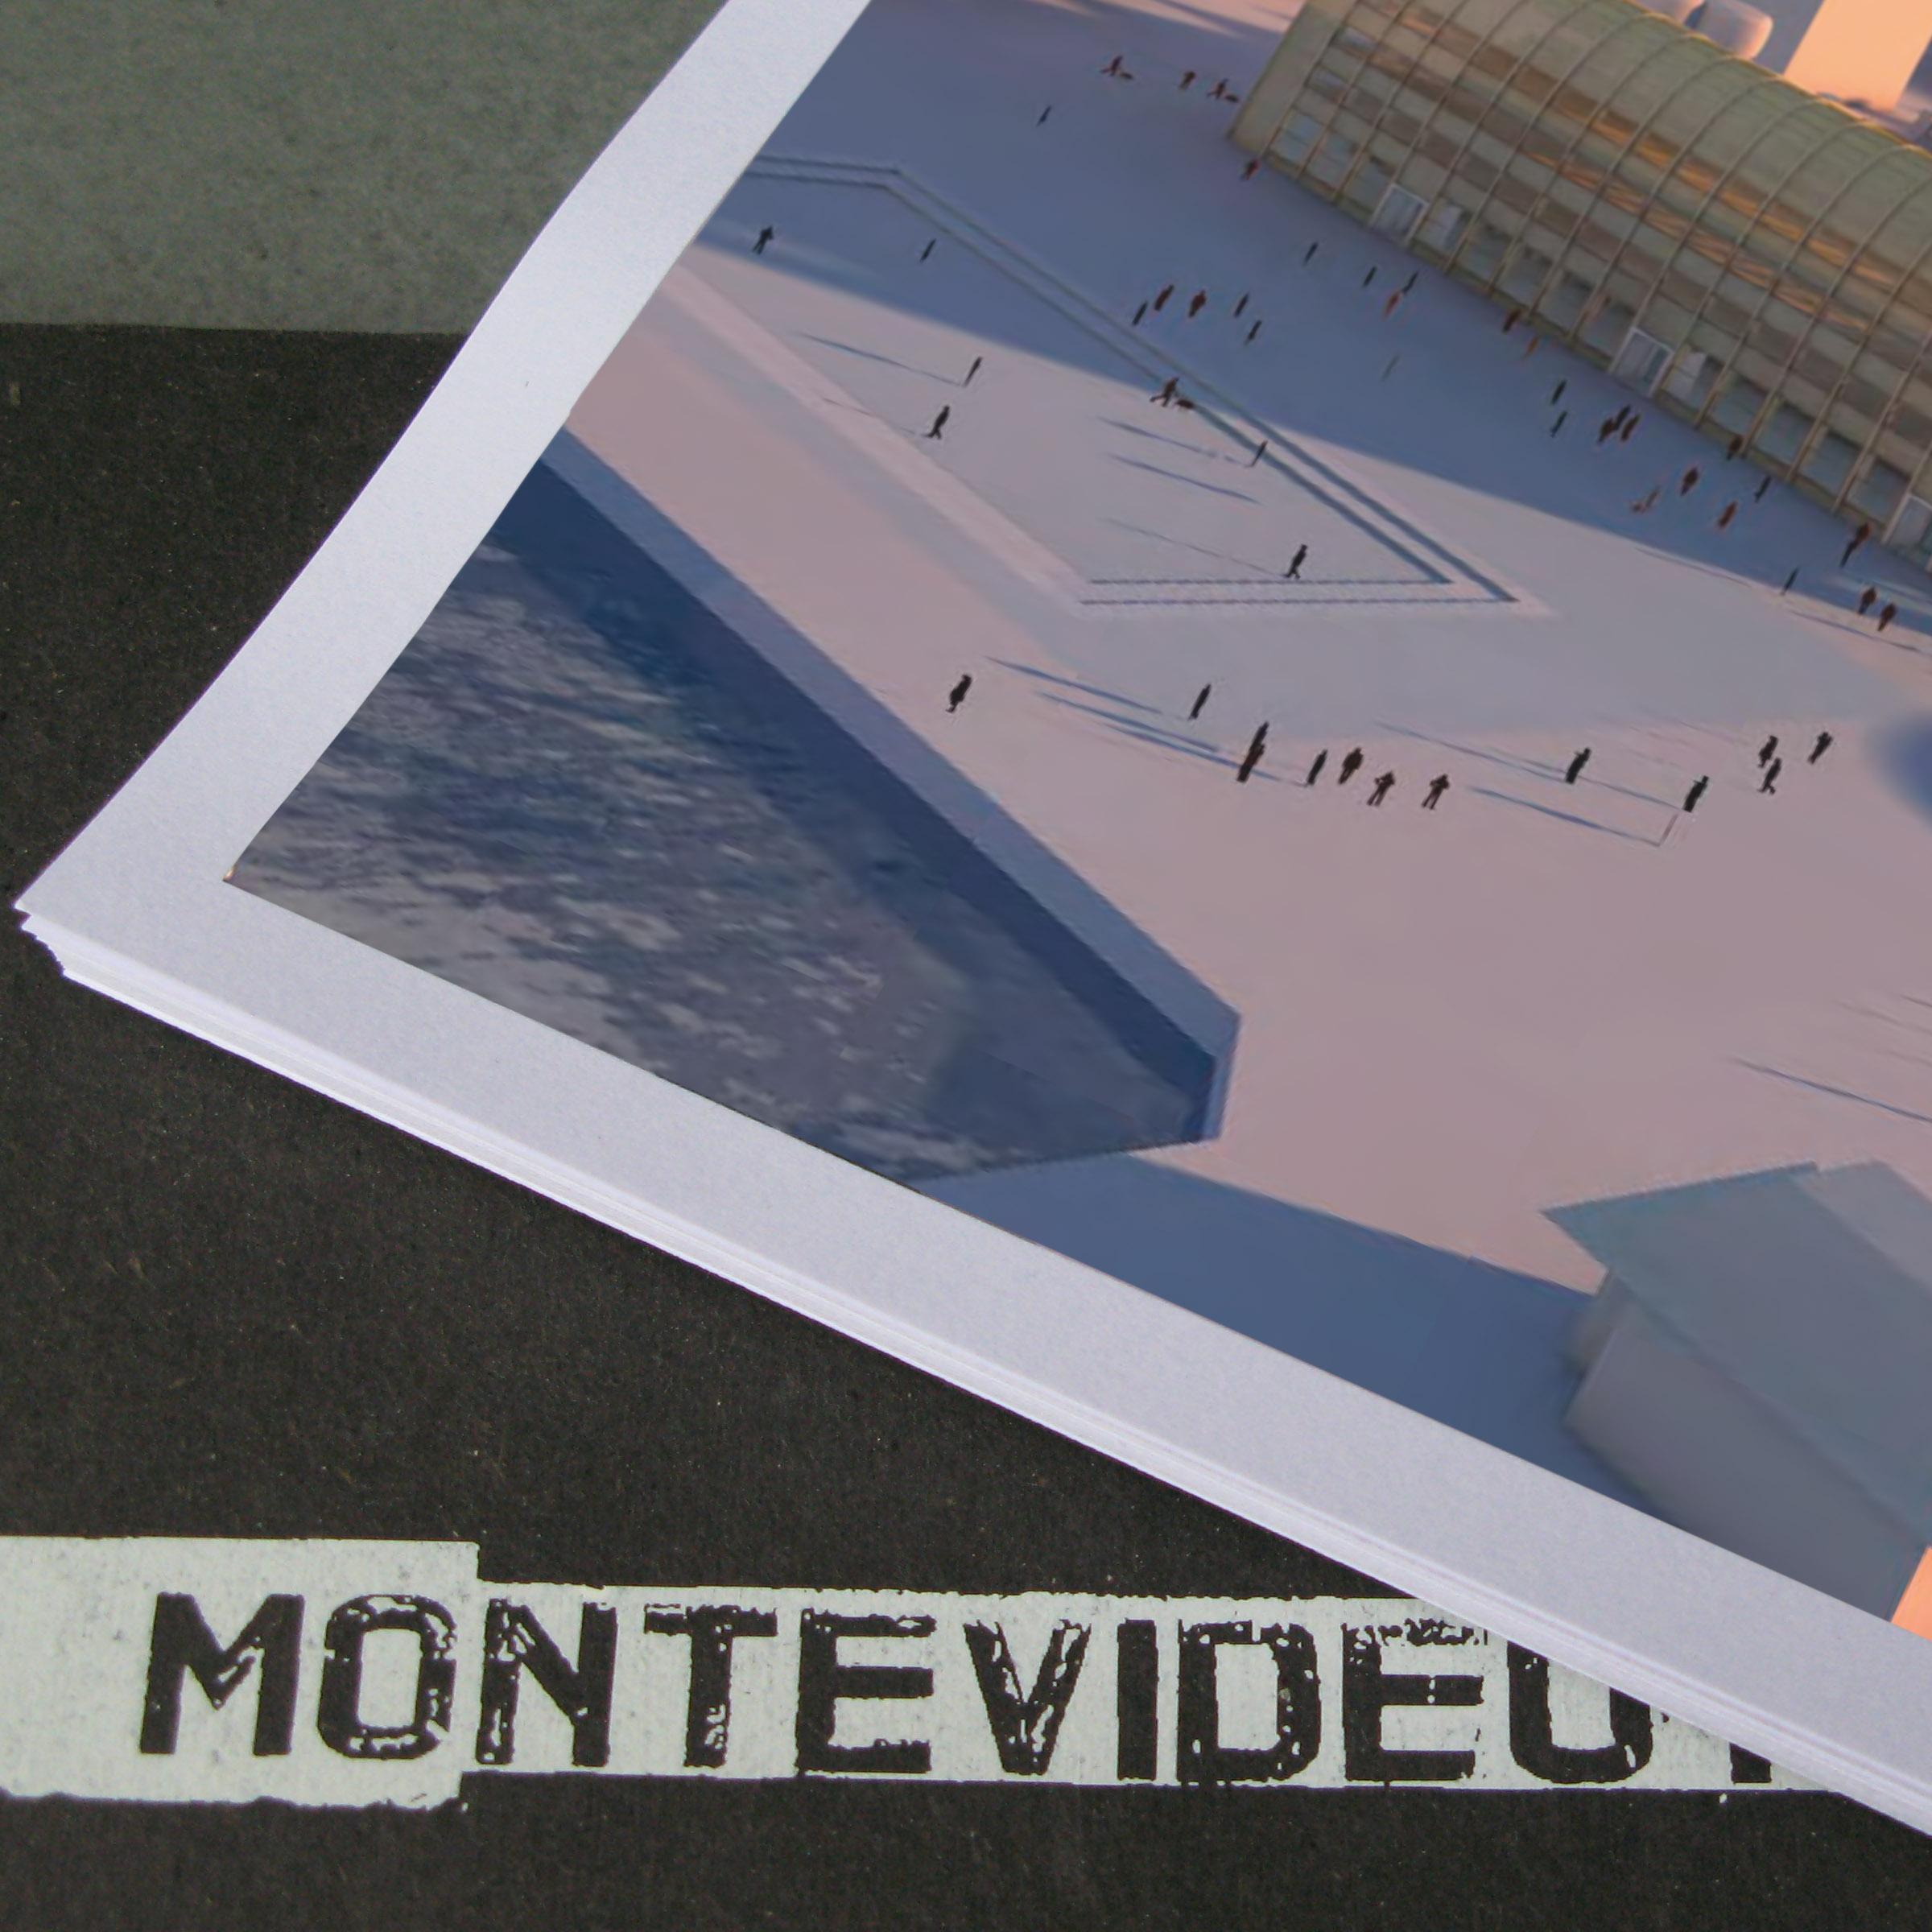 Icon_MontevideoPortfolio.jpg